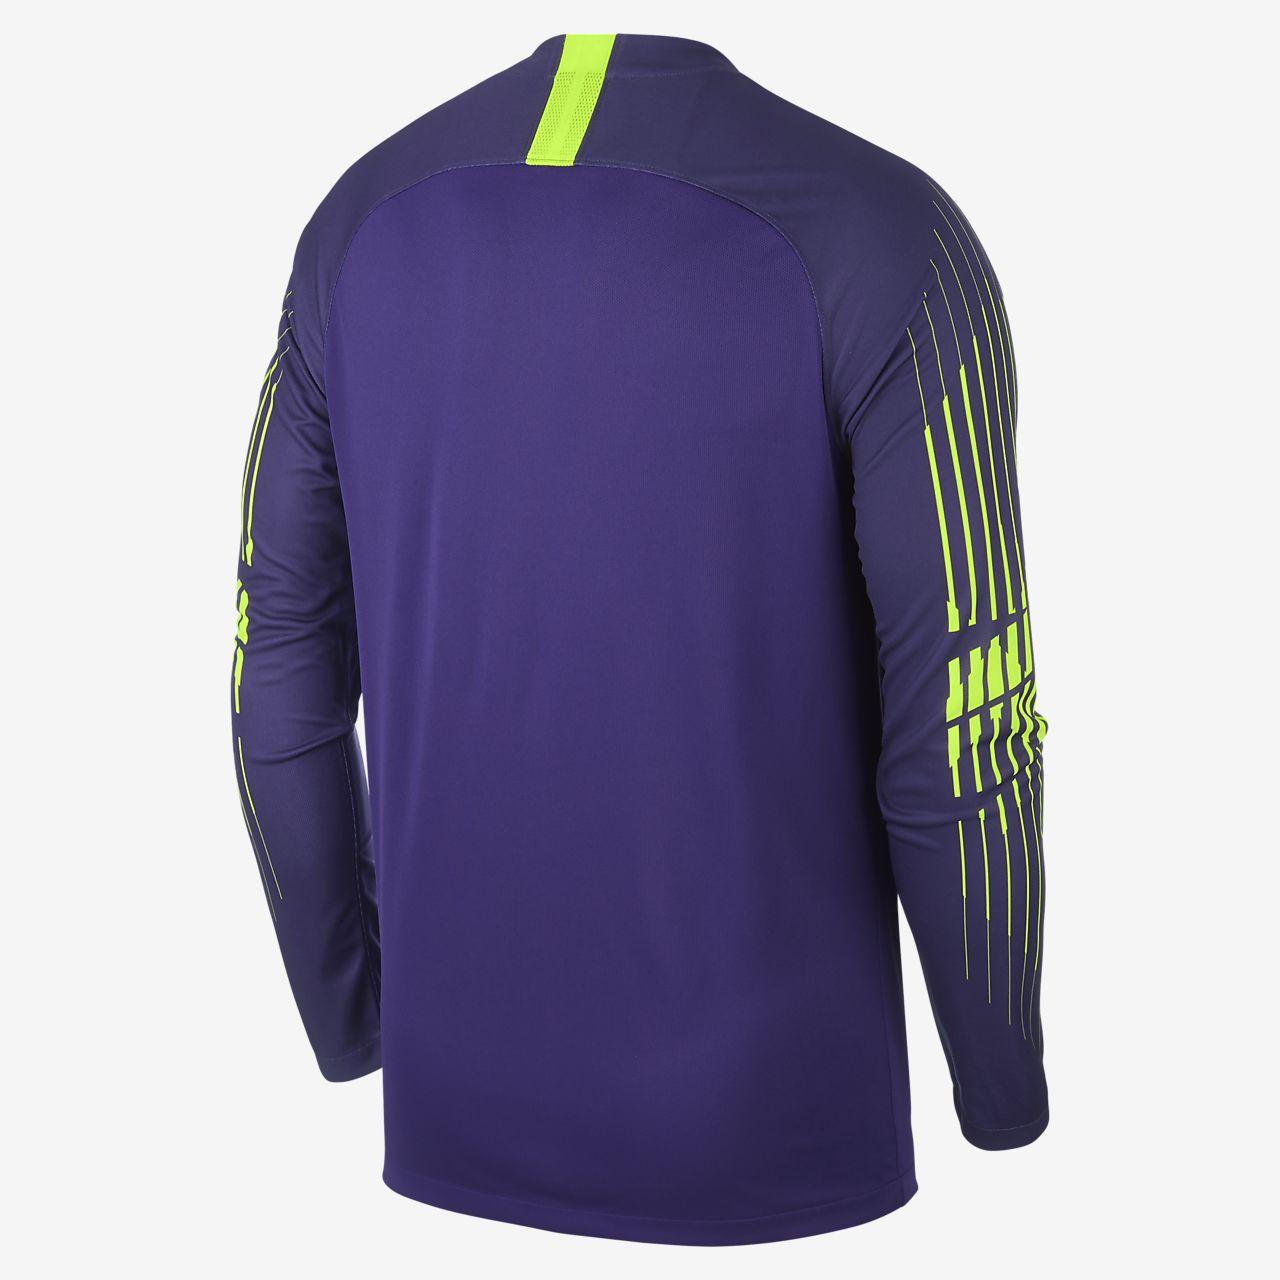 2adf1d777 ... 2018 19 Tottenham Hotspur Stadium Goalkeeper Men s Long-Sleeve Football  Shirt